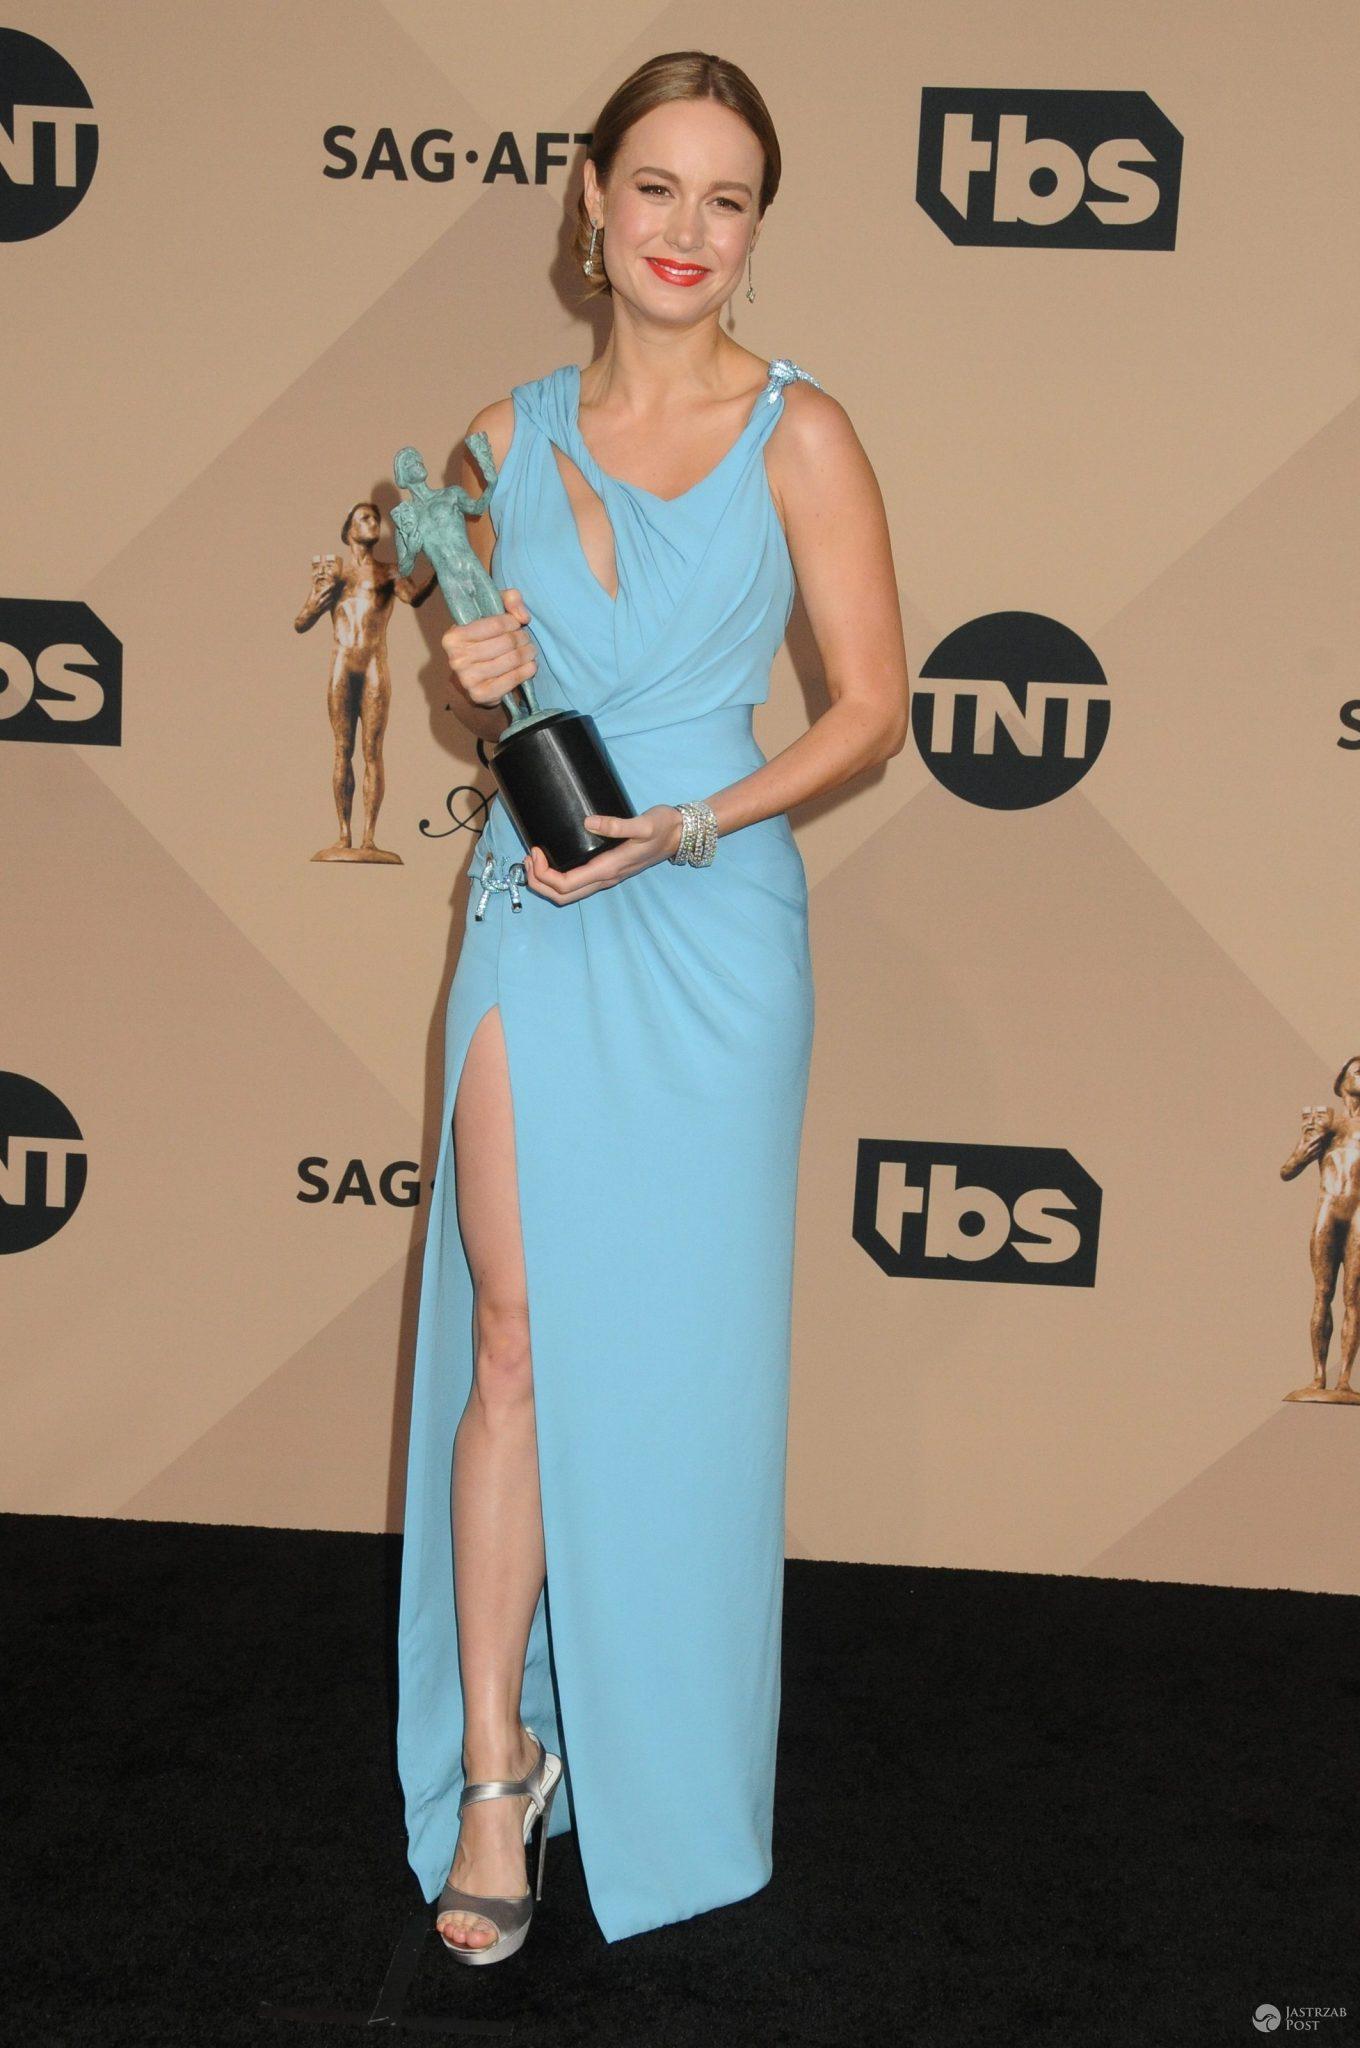 Kreacja: Atelier Versace. Brie Larson, SAG Awards 2016 (fot. ONS)